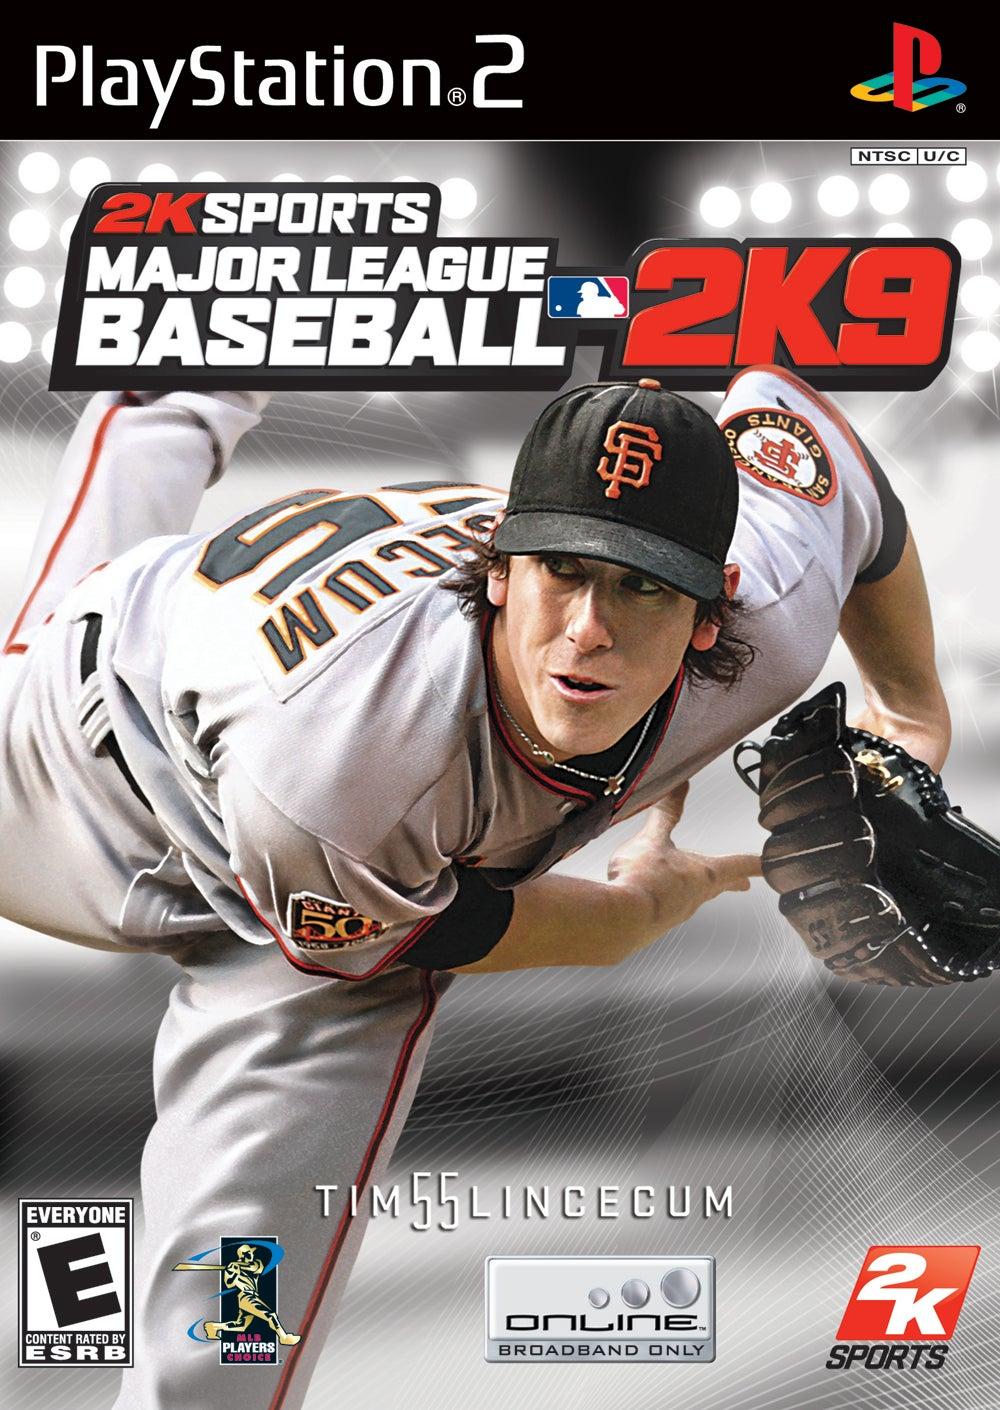 Major League Baseball 2K9 Review IGN